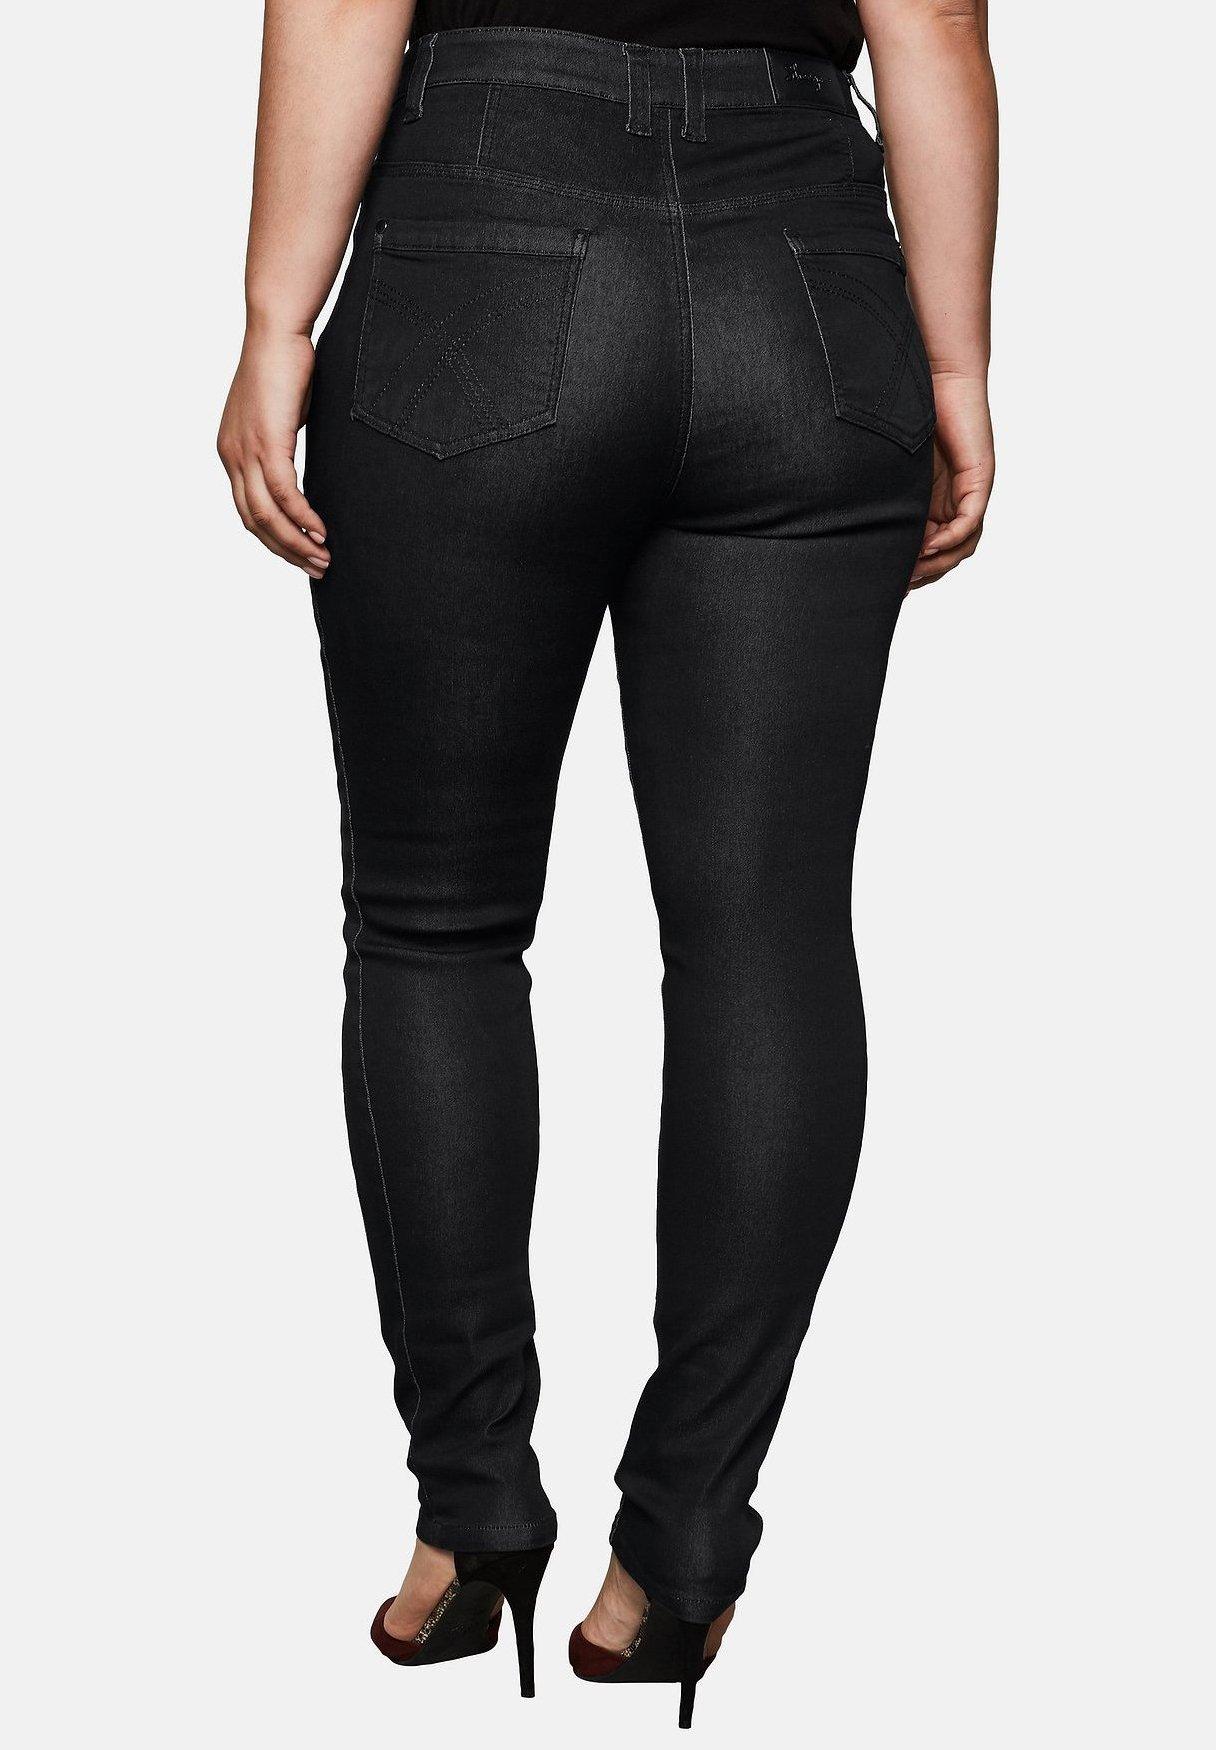 Sheego Jeans Skinny Fit Black Denim xVtEp7Ge